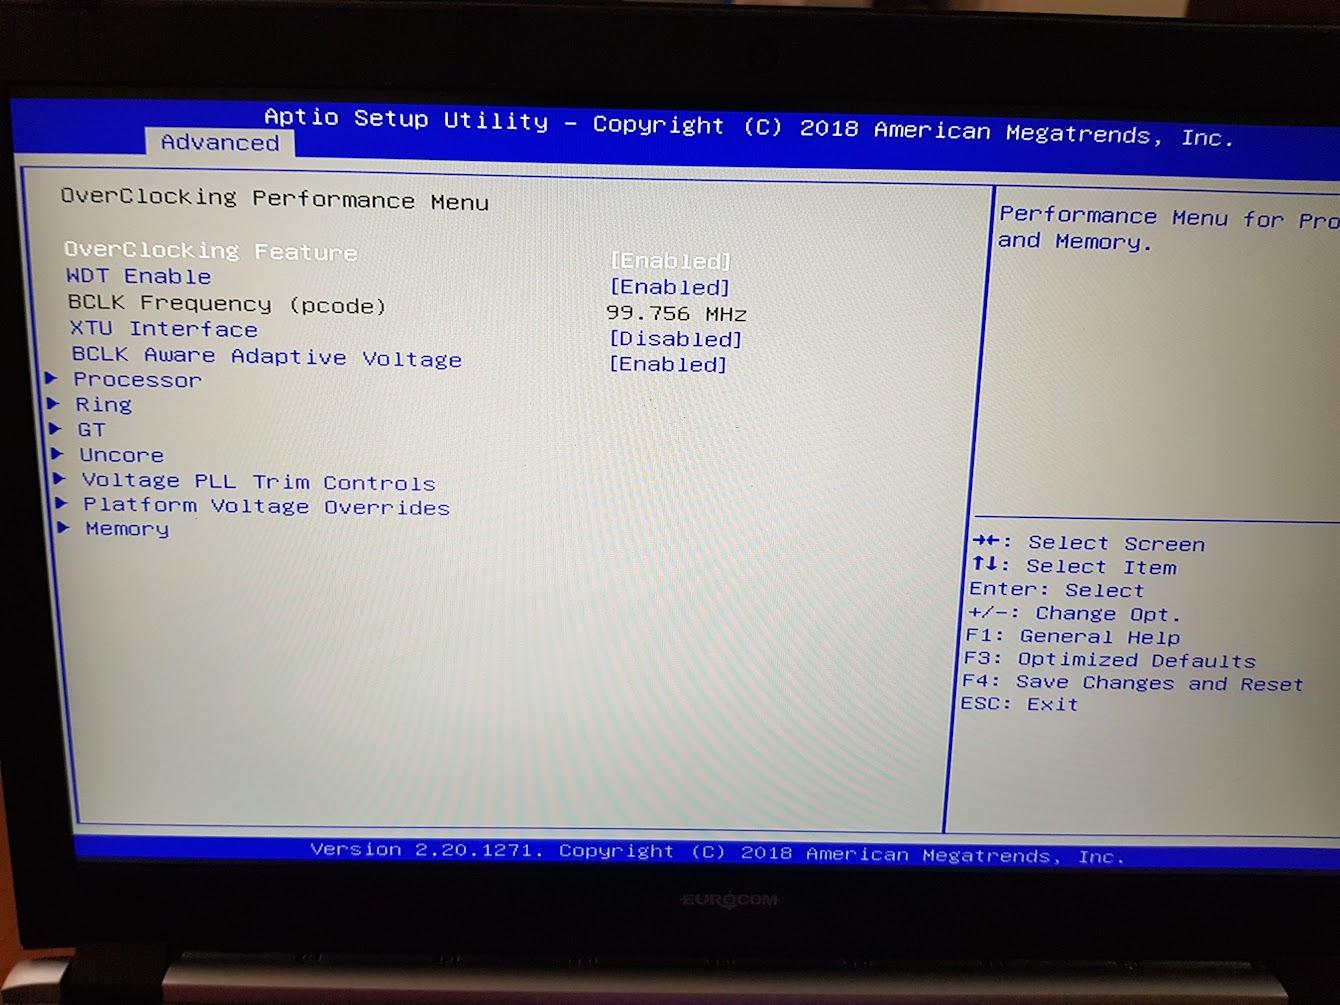 Installing Ubuntu 18 04LTS on the Eurocom Q6, among other